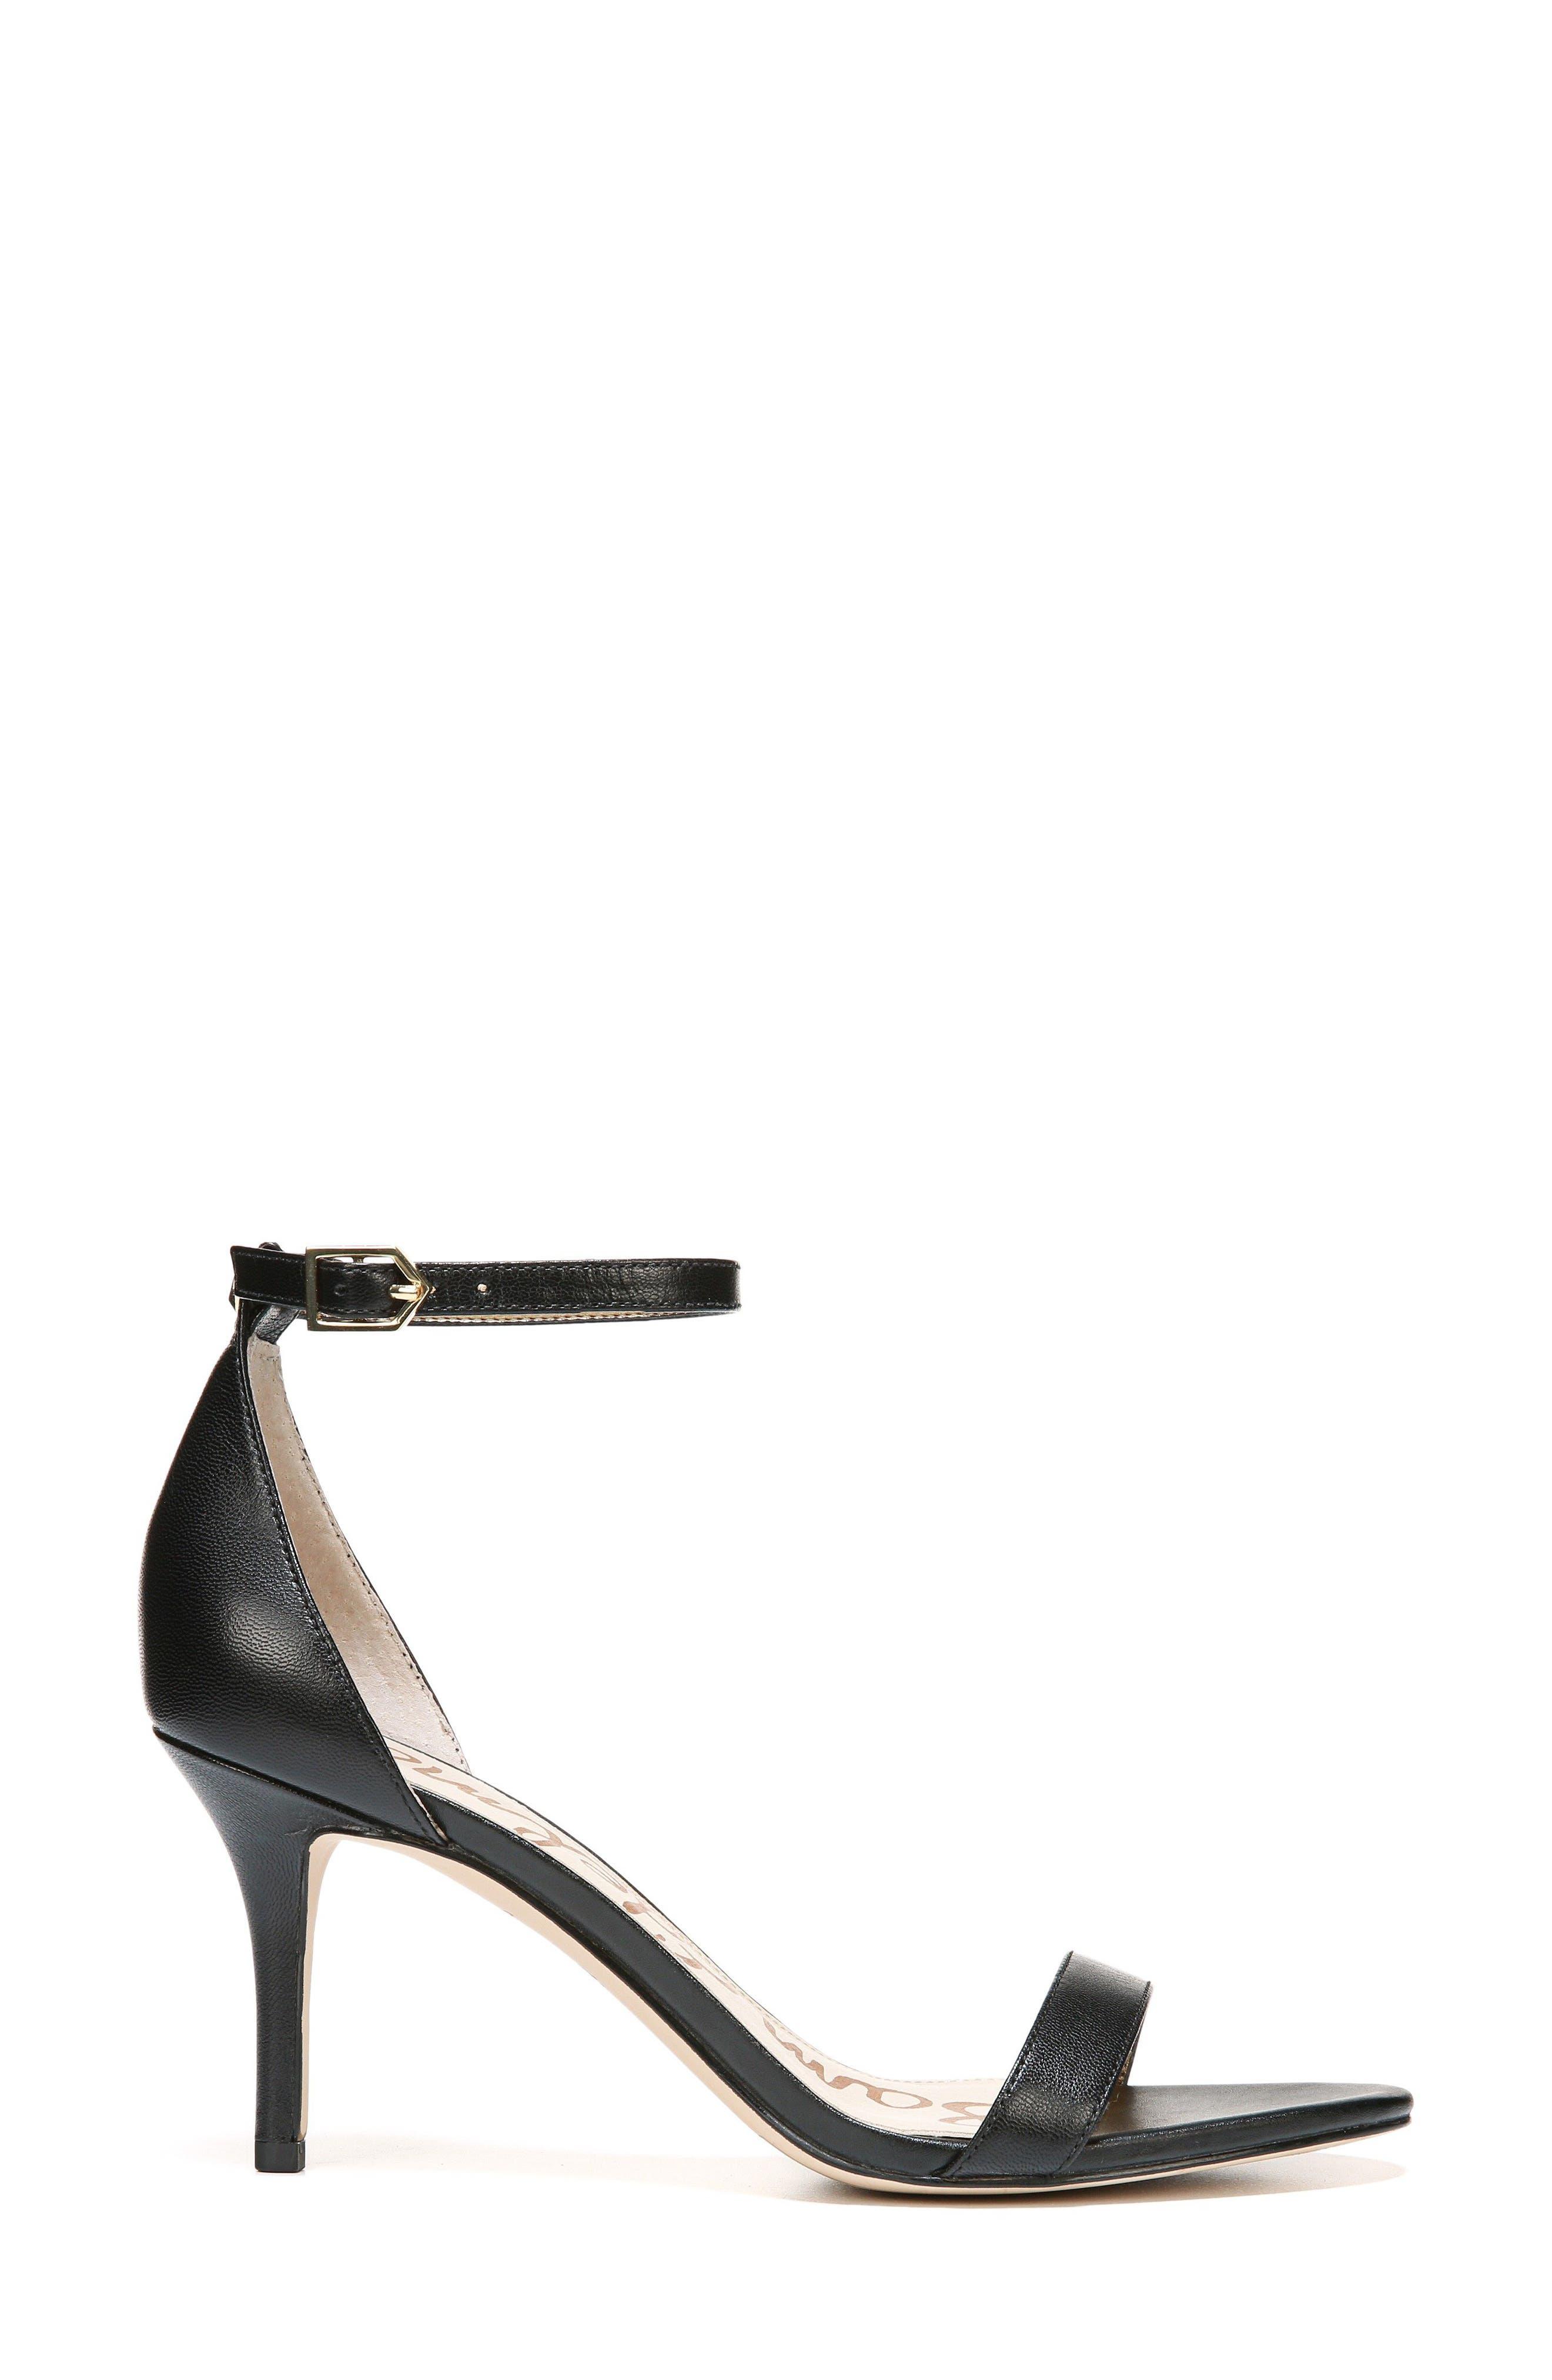 ,                             'Patti' Ankle Strap Sandal,                             Alternate thumbnail 146, color,                             004